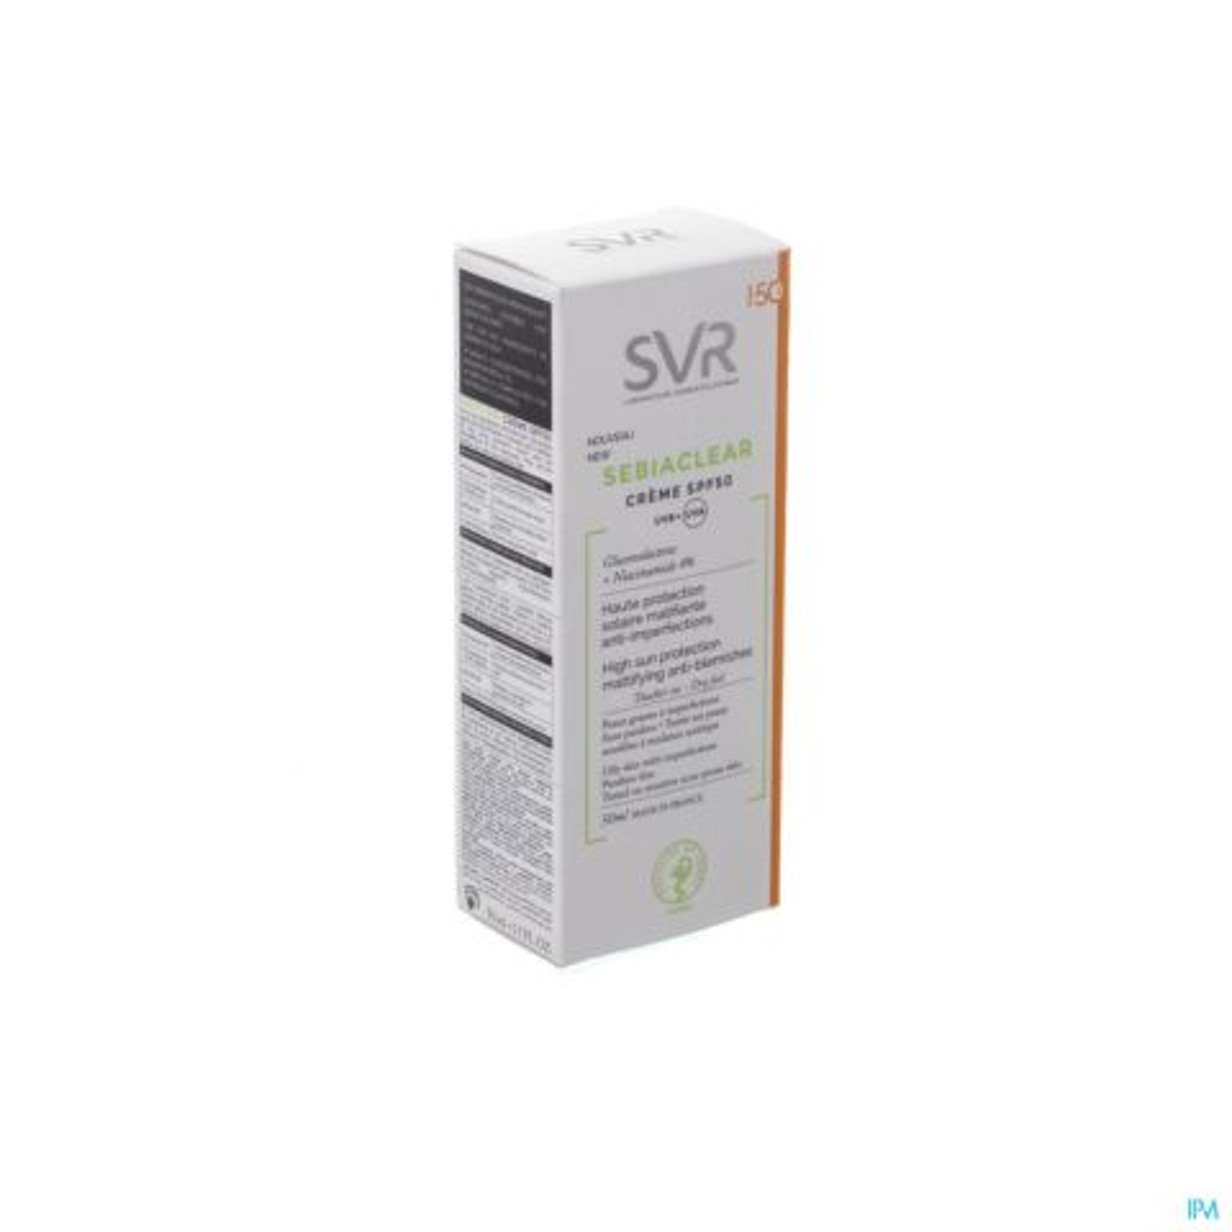 SVR Sebiaclear Crème IP50 Haute Protection Solaire Matifiante Anti-Imperfections Tube 50ml